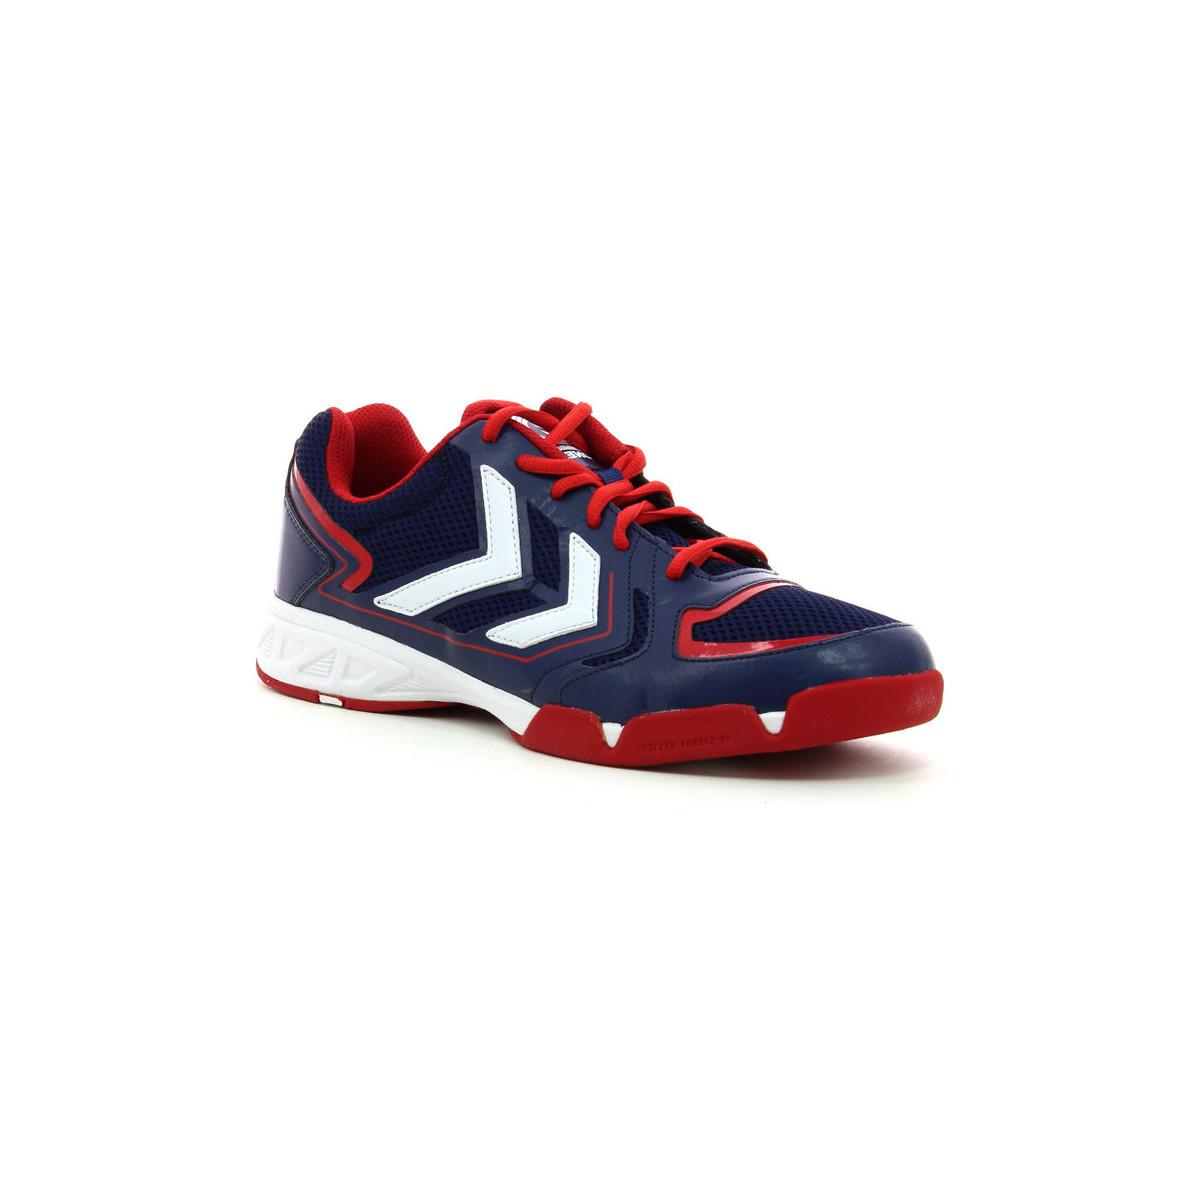 Hummel Celestial X5 Marine/rouge - Schuhe Indoorschuhe  39,90 €